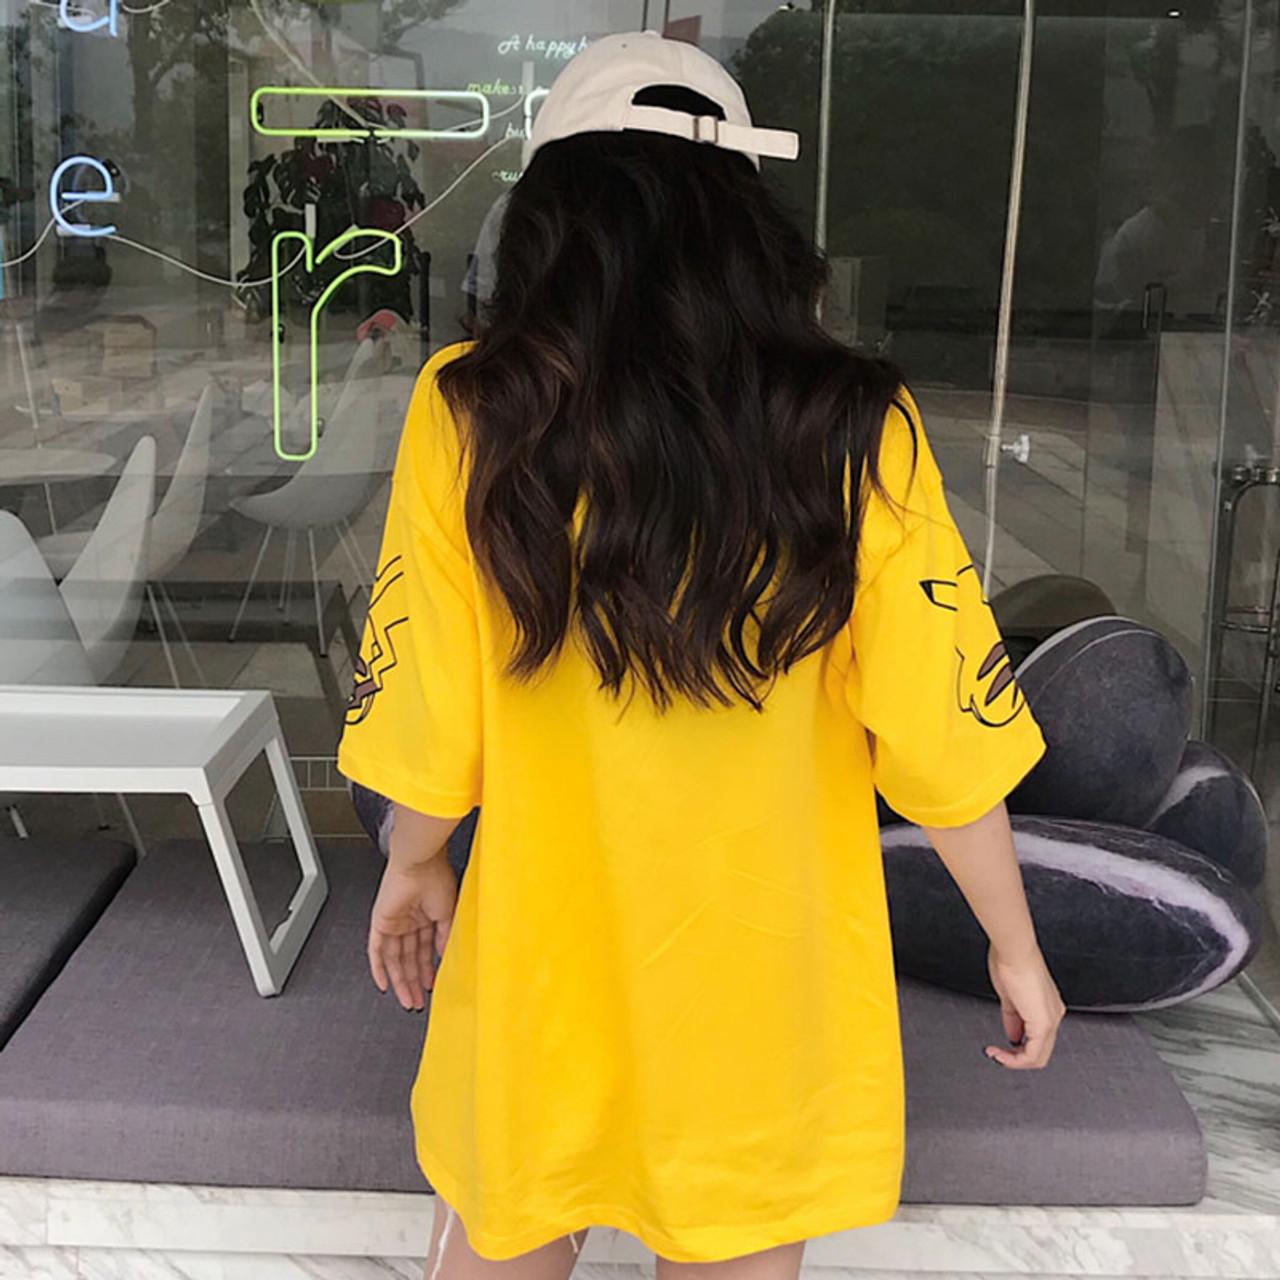 d2b5a3167f ... Harajuku Kawaii Cartoon Print Short Sleeve long T Shirt Tops Women  Summer Korean Fashion Yellow Cute ...